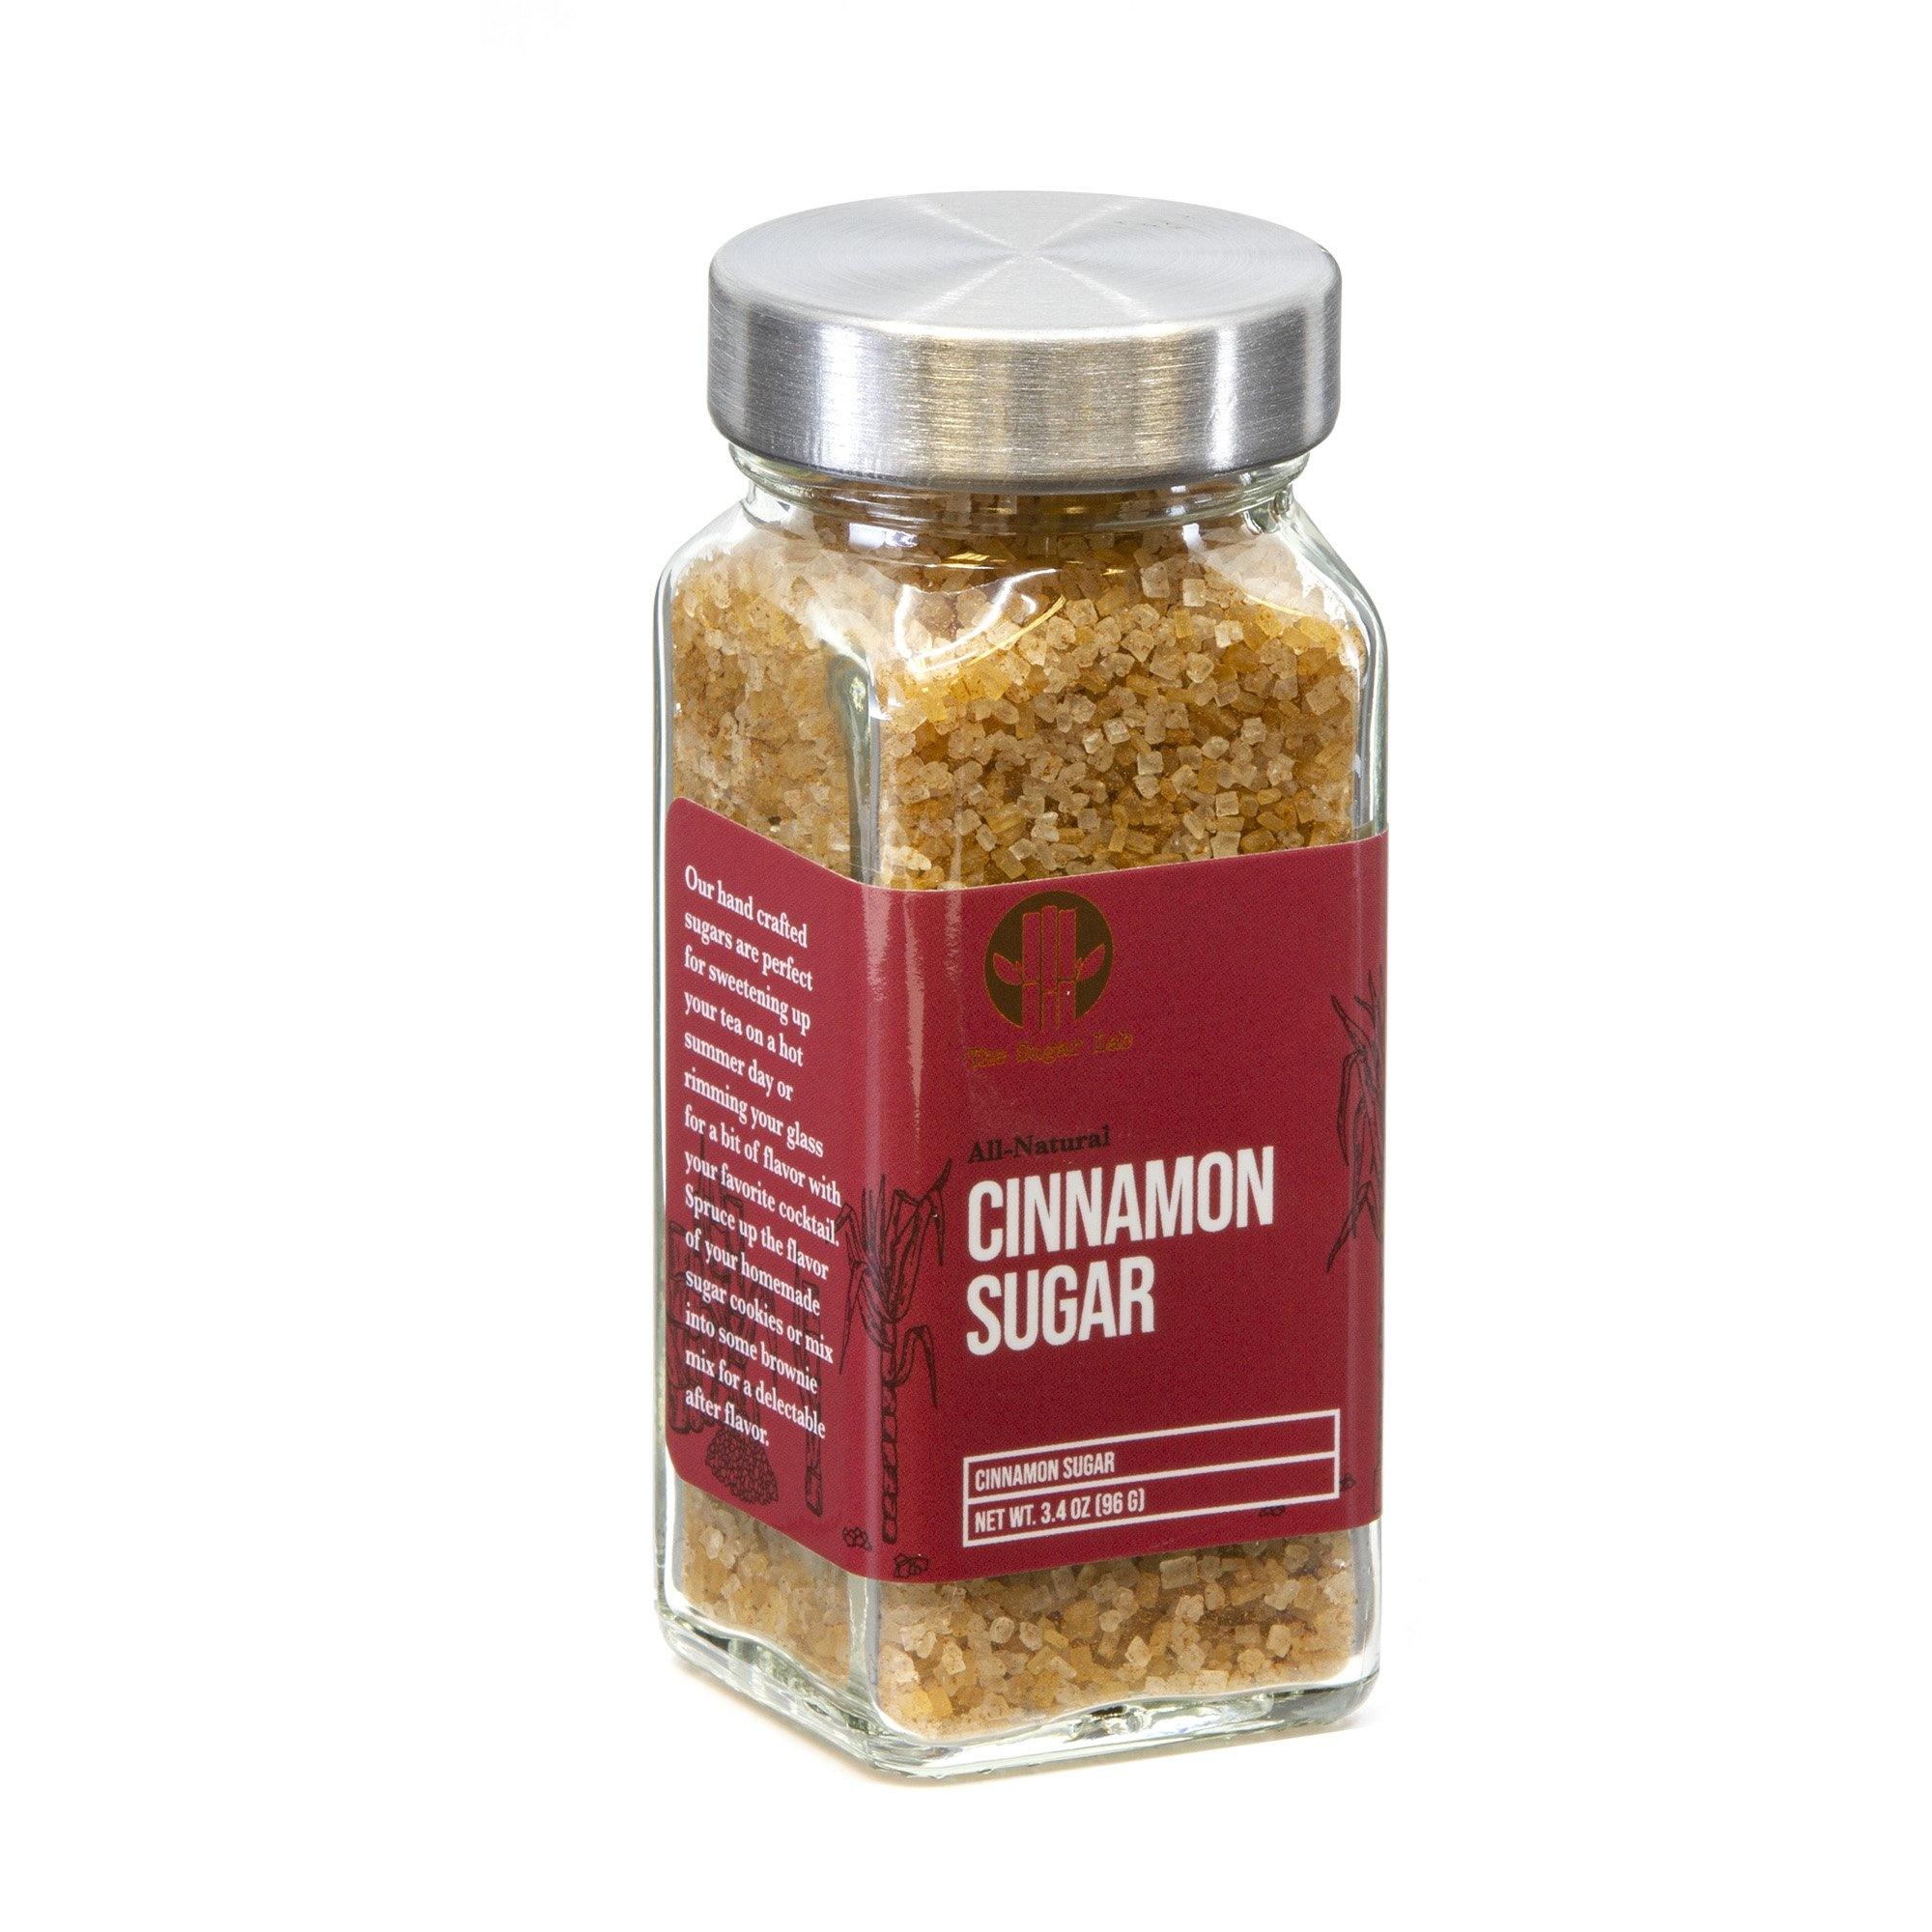 SPICE LAB CINNAMON SUGAR-1